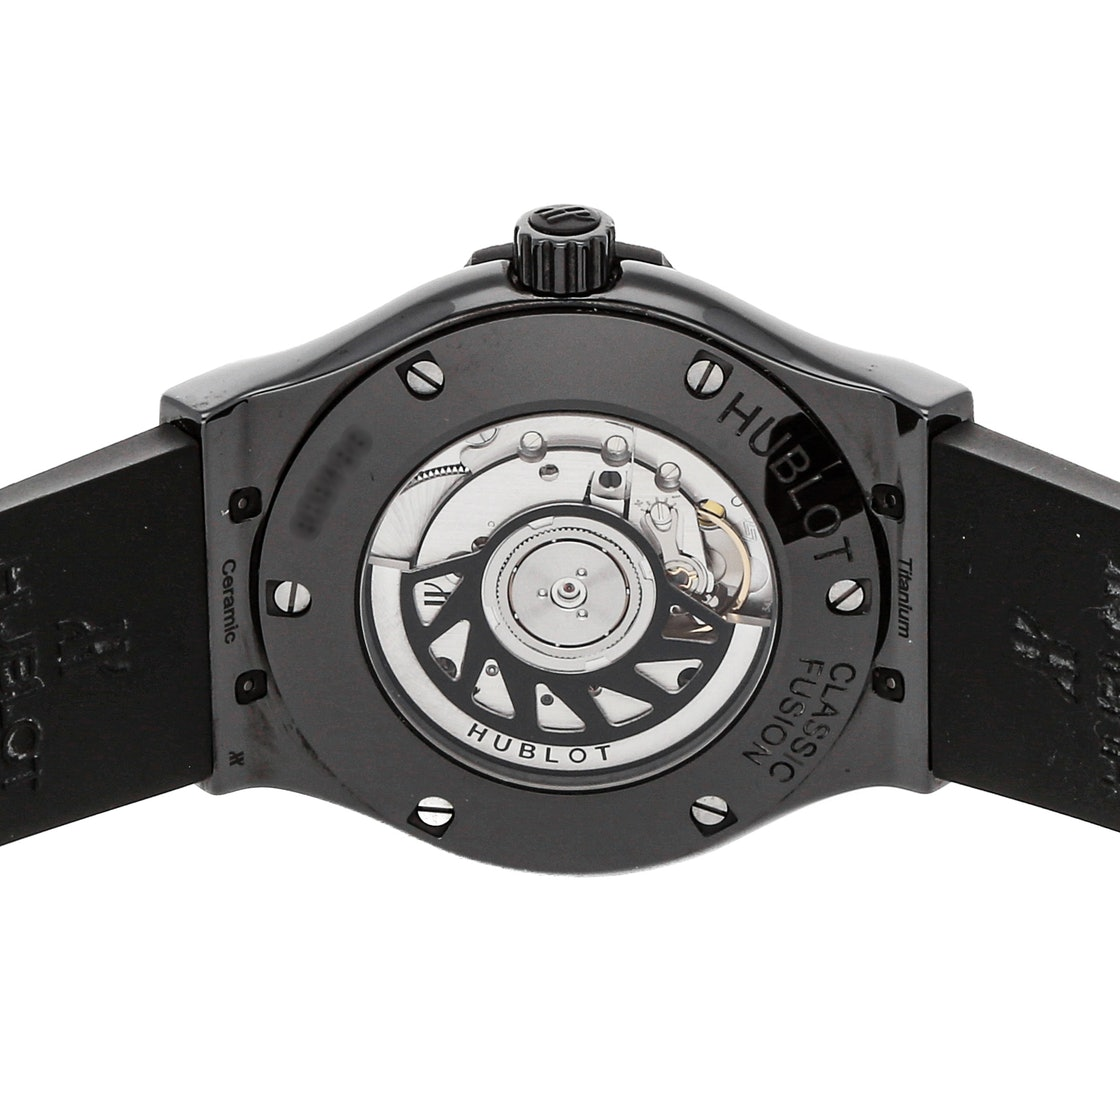 Hublot Classic Fusion 542.CM.1770.RX